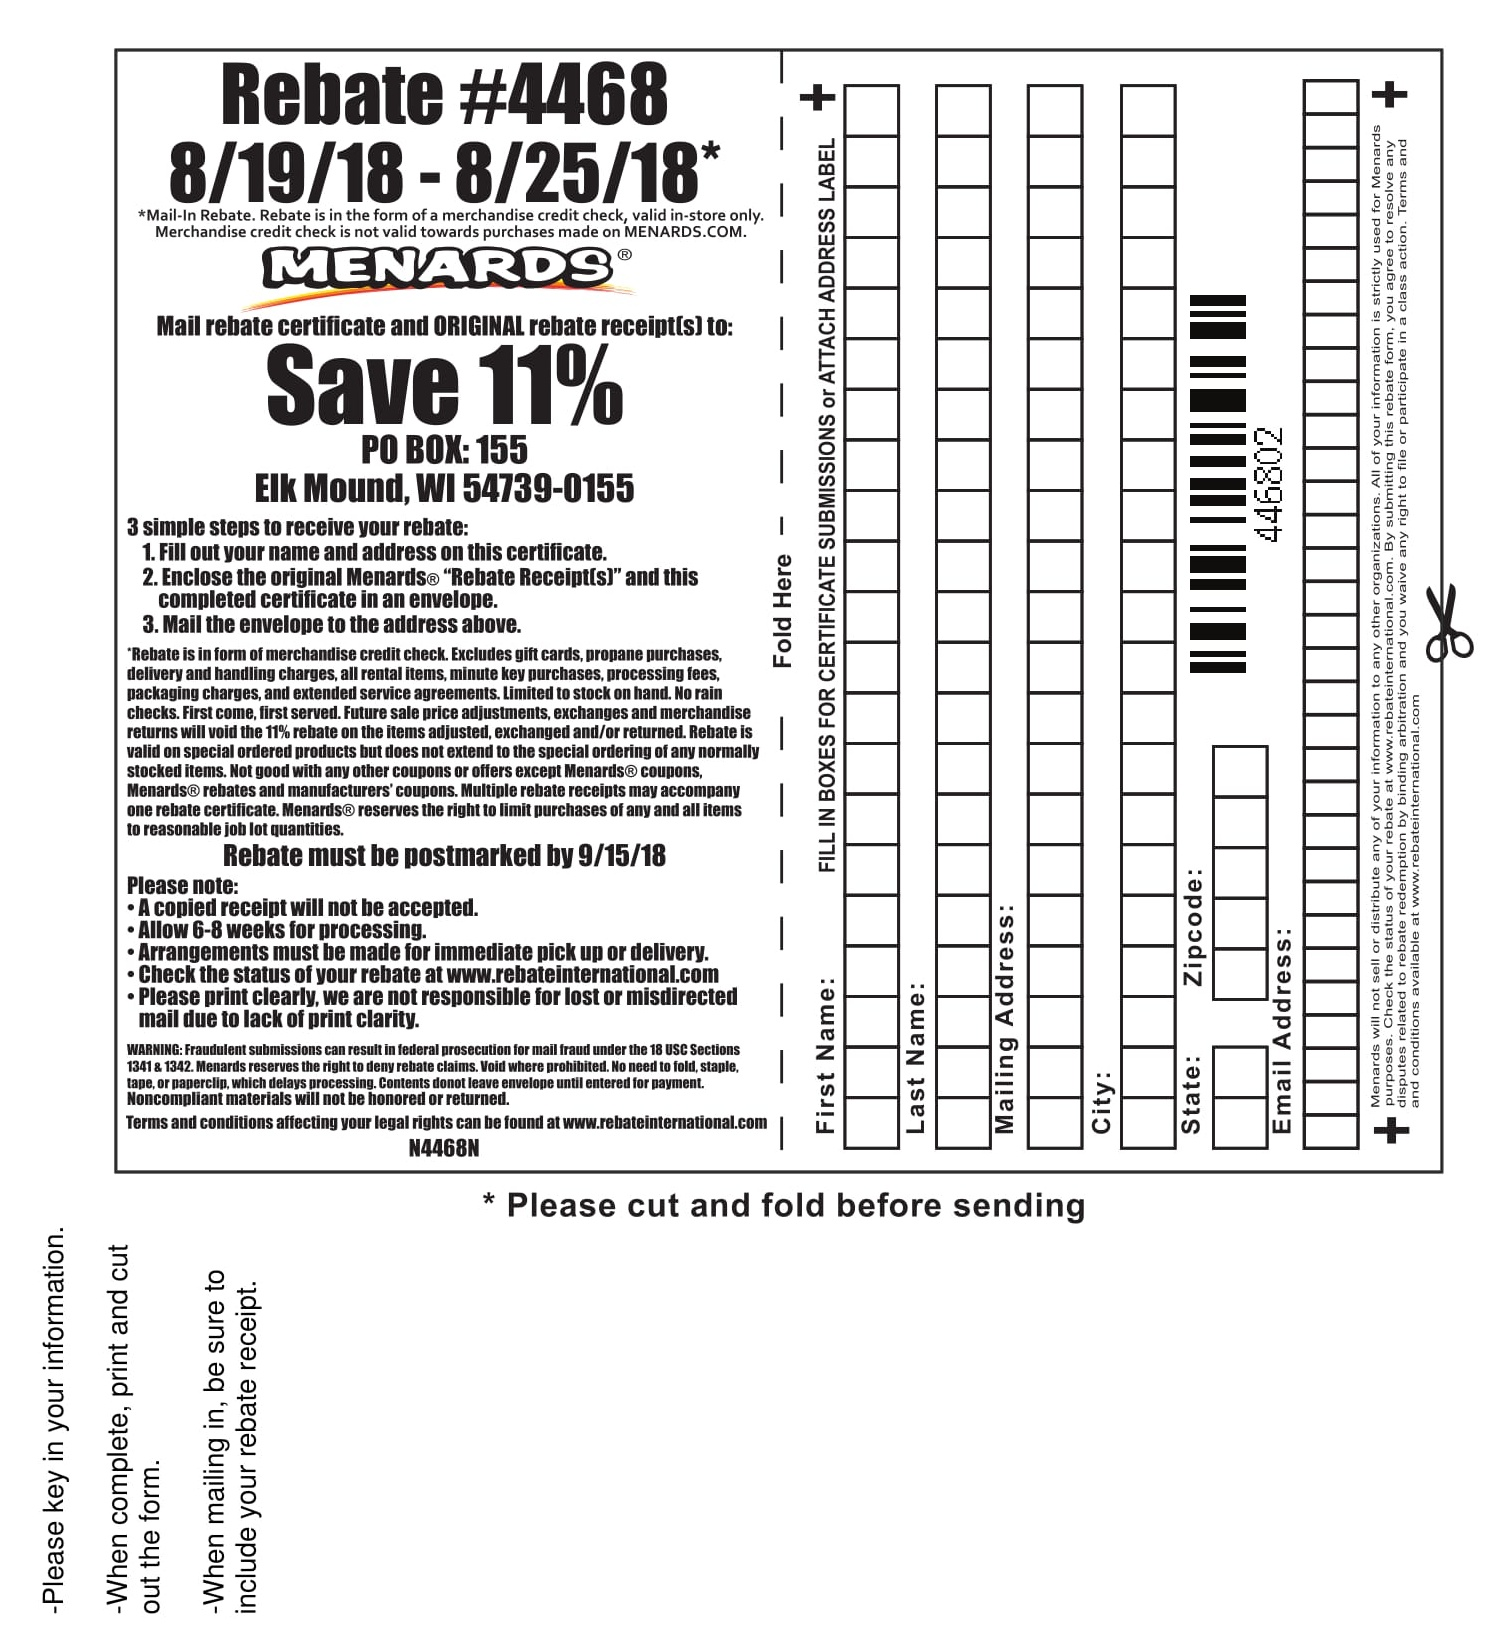 Menards 11% Rebate #4468 – Purchases 8/19/18 – 8/25/18